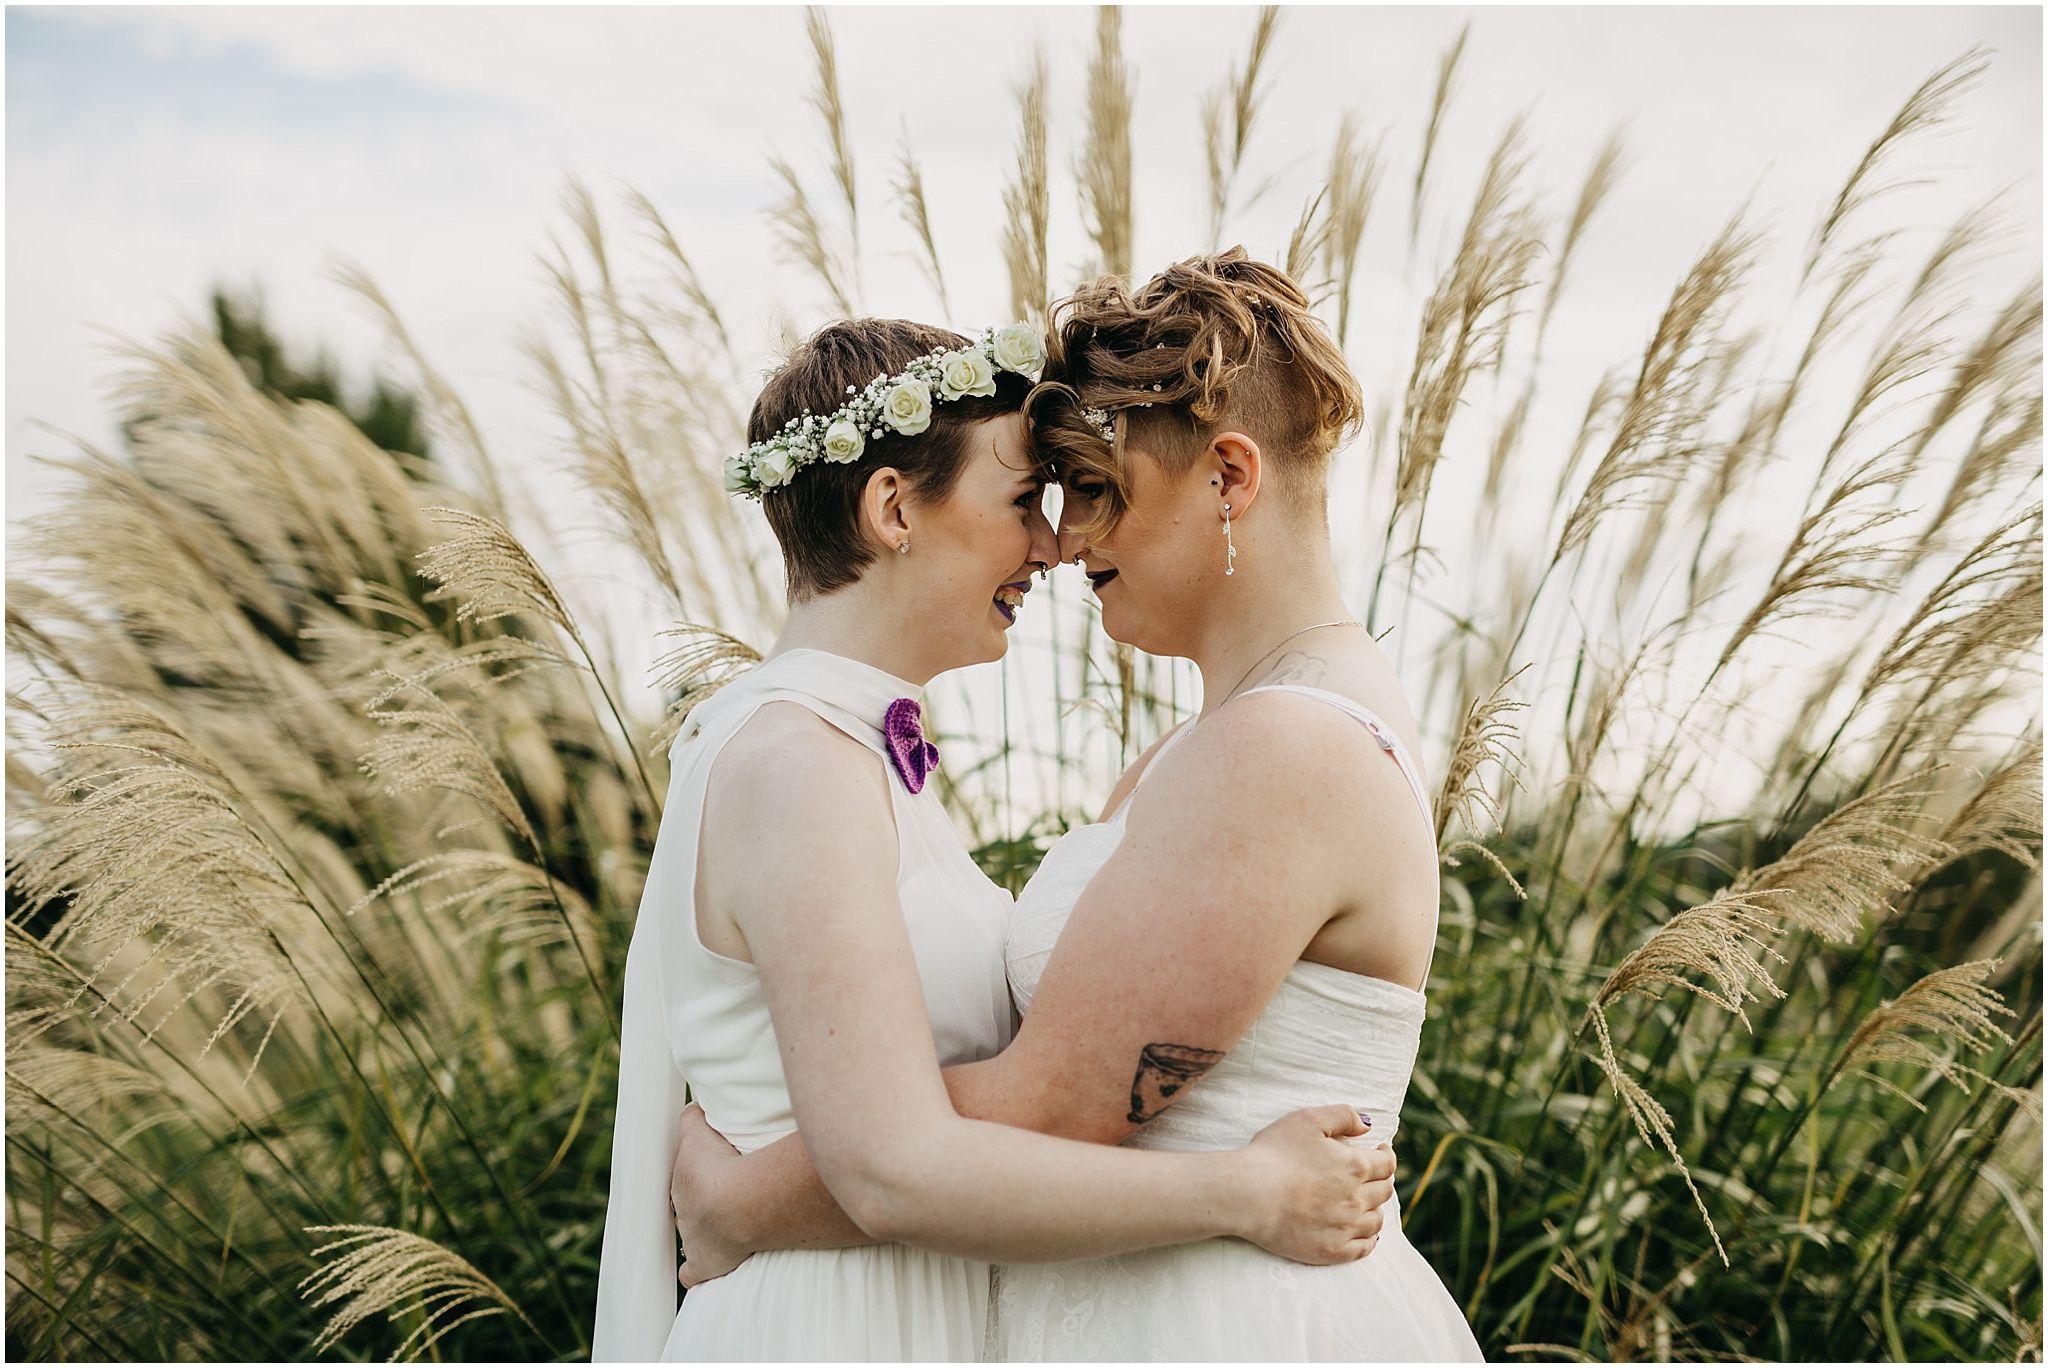 same sex couple wedding portrait pitt meadows outdoor wedding